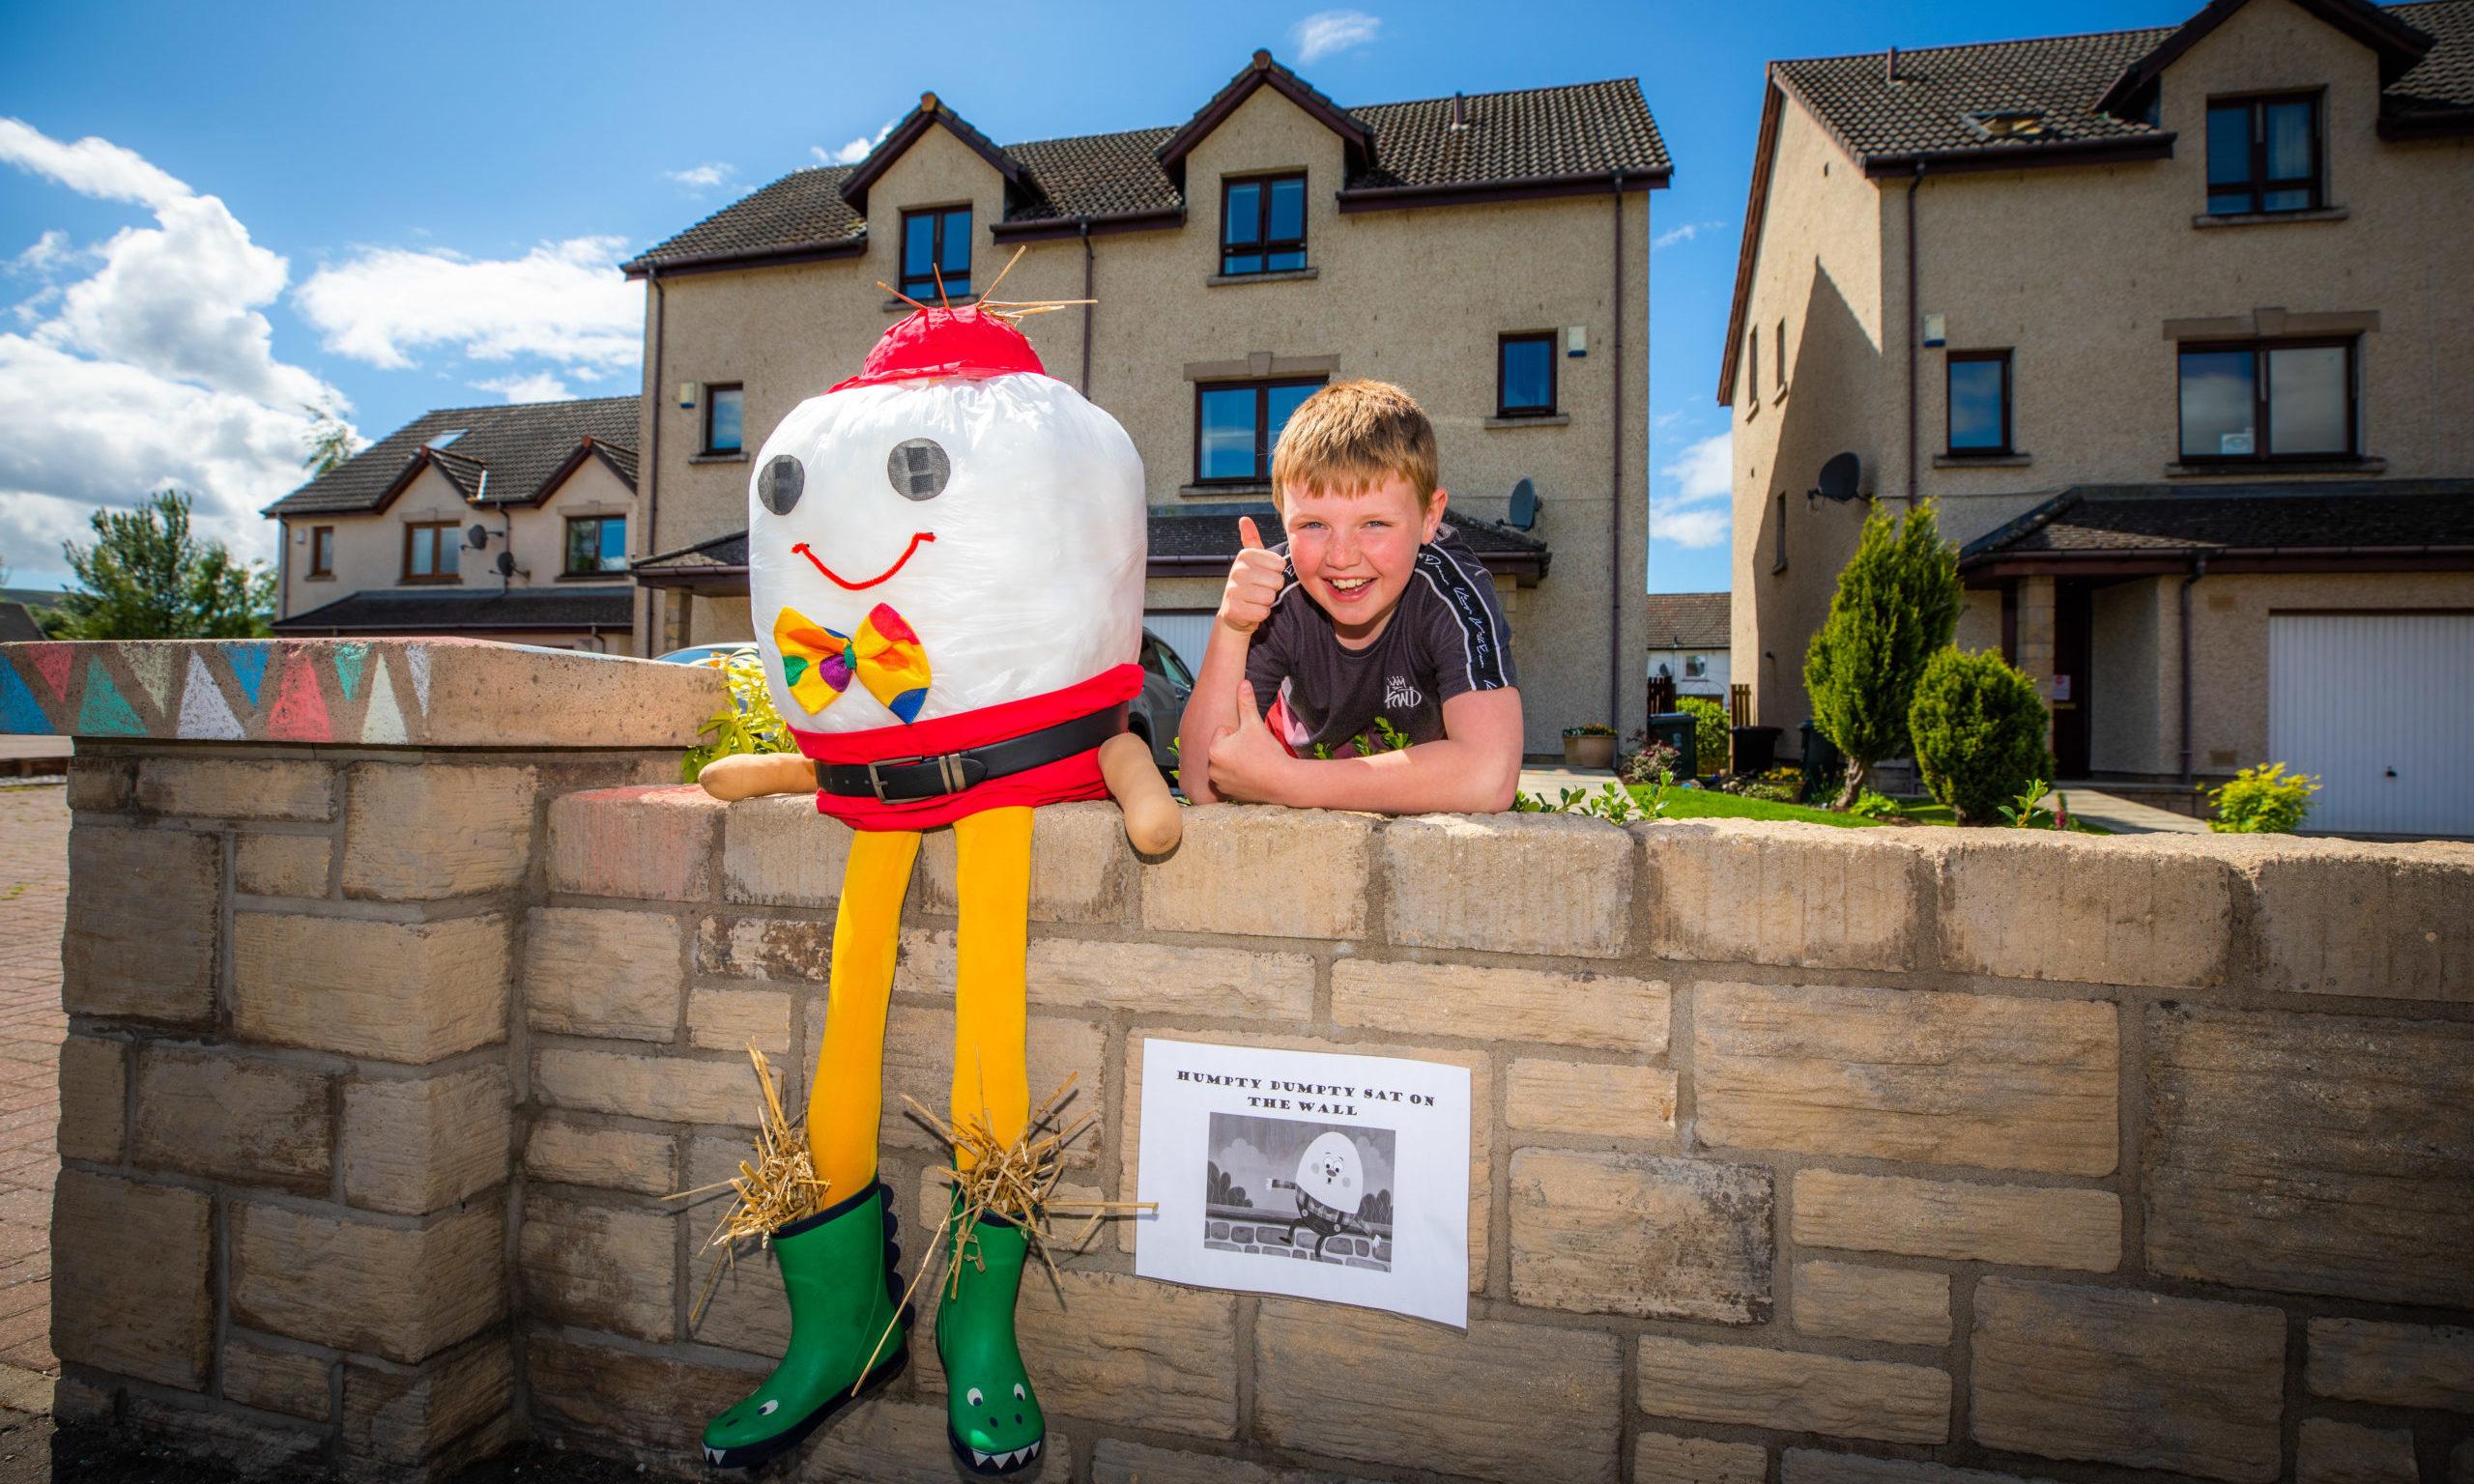 Jaxon Gahan, aged 10, with his Humpty Dumpty scarecrow.